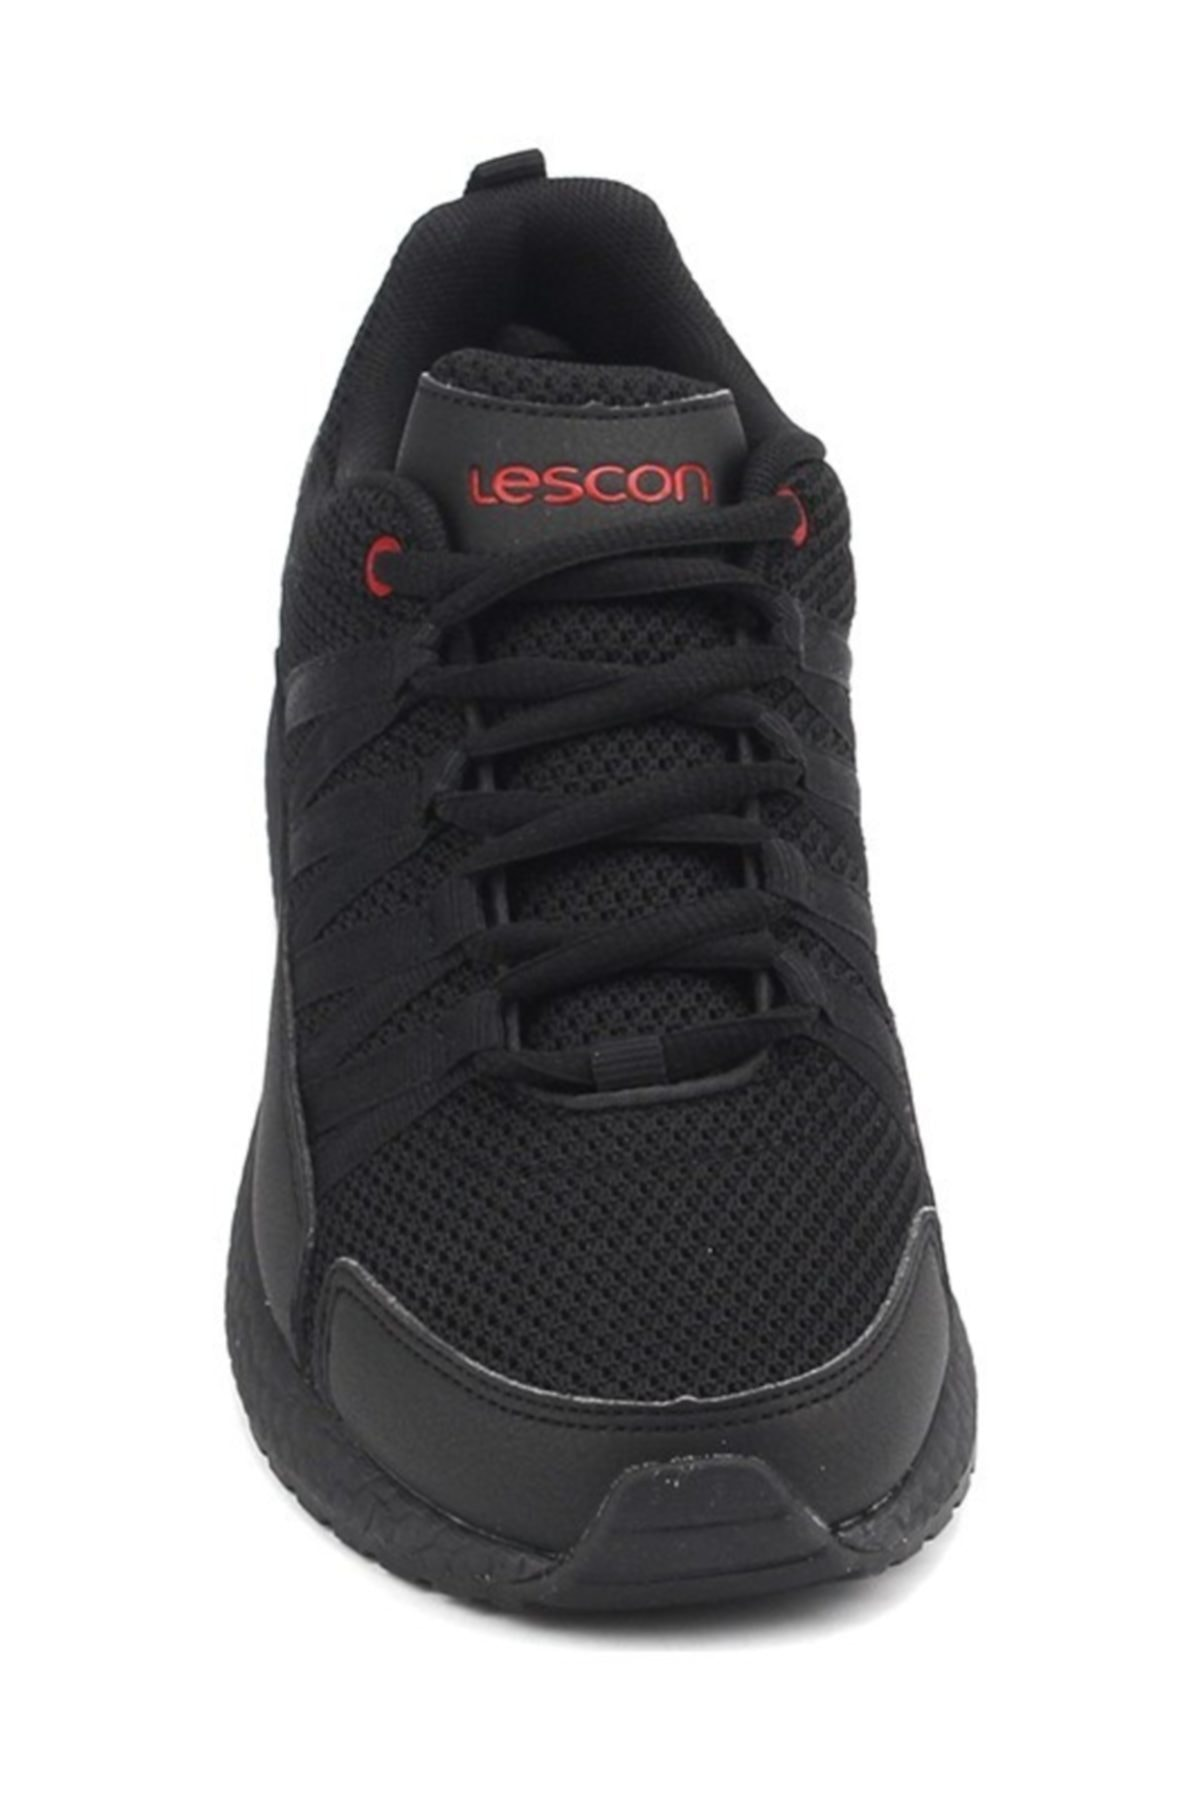 Lescon Bayan Easystep Ayakkabı L-5616 1